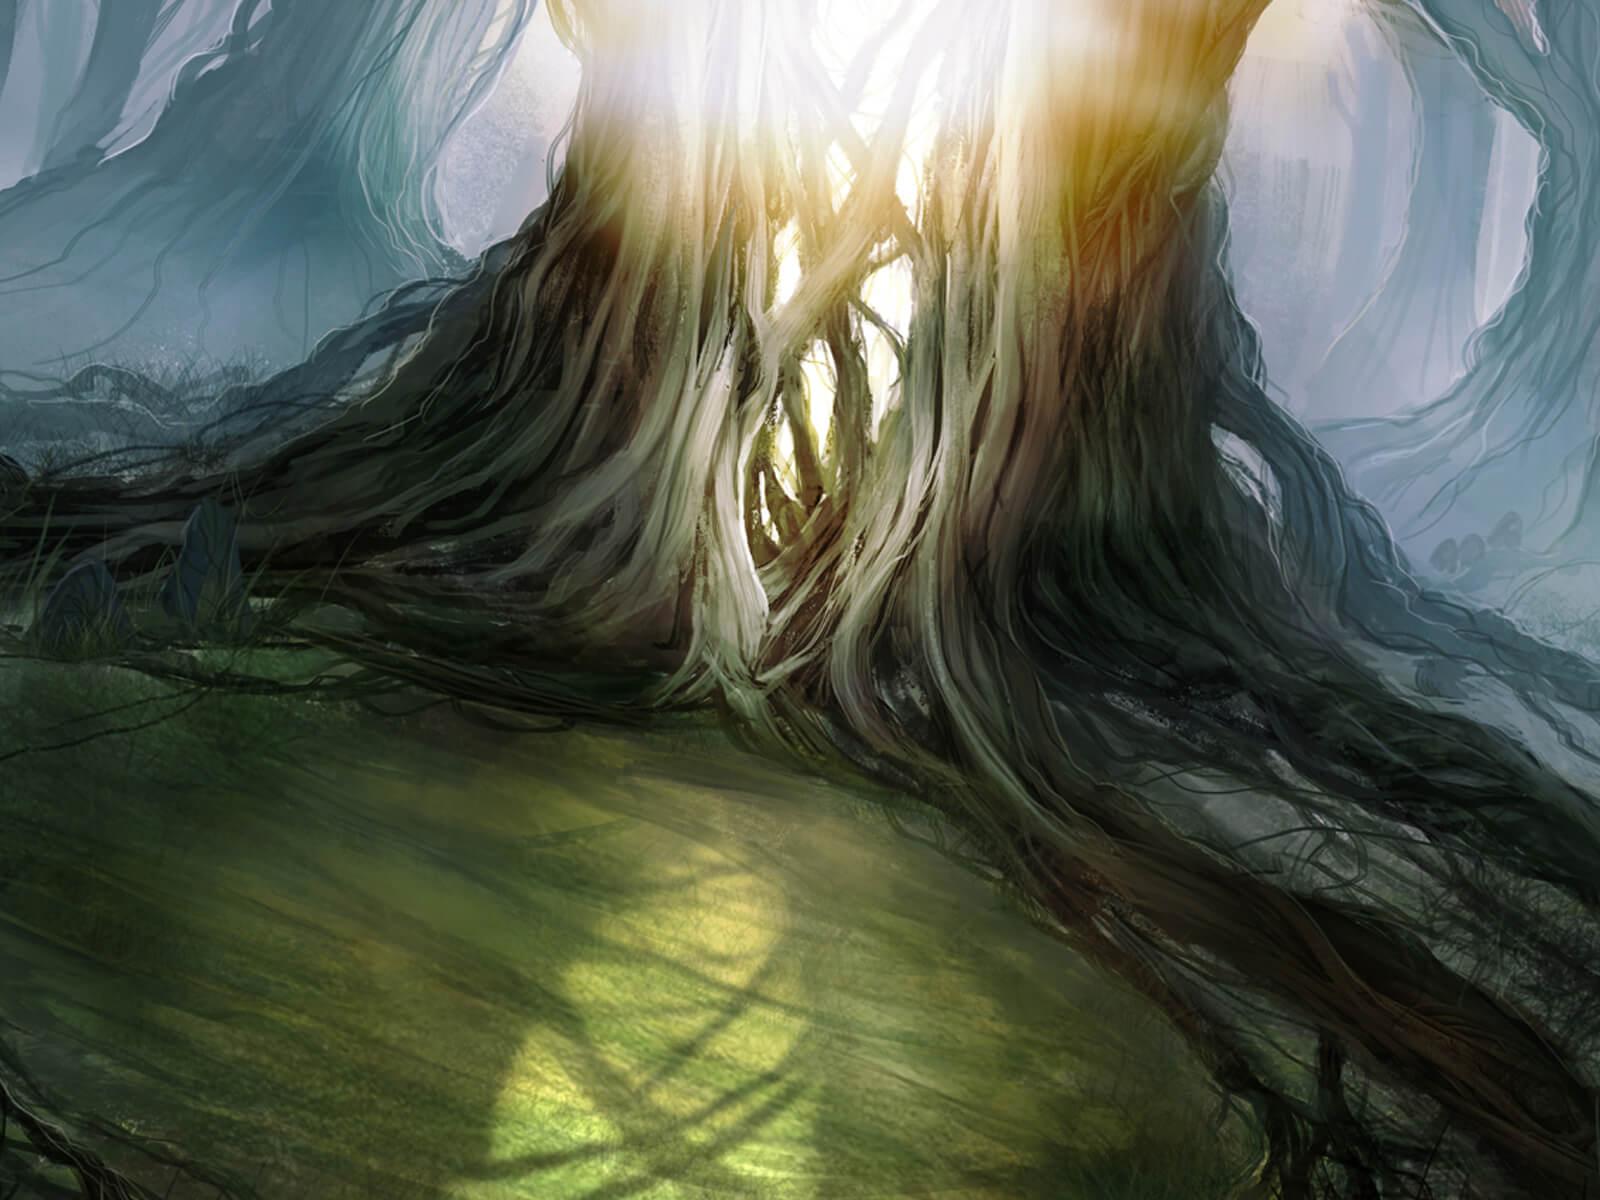 sun shining through gnarled vines